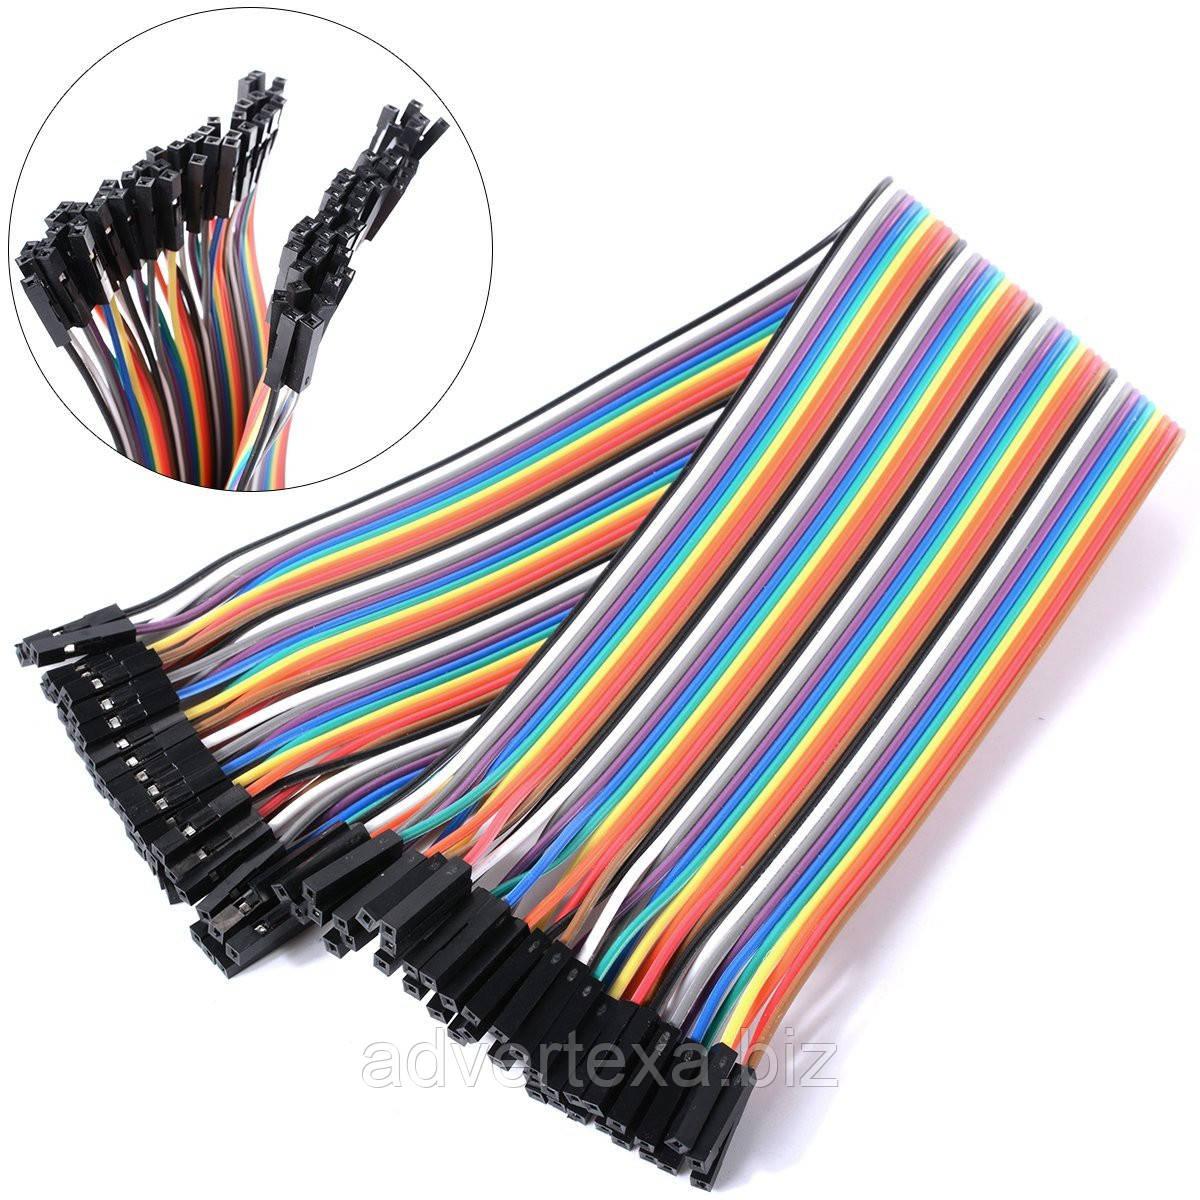 40 штук Dupont Дюпон кабель мама-мама 20см